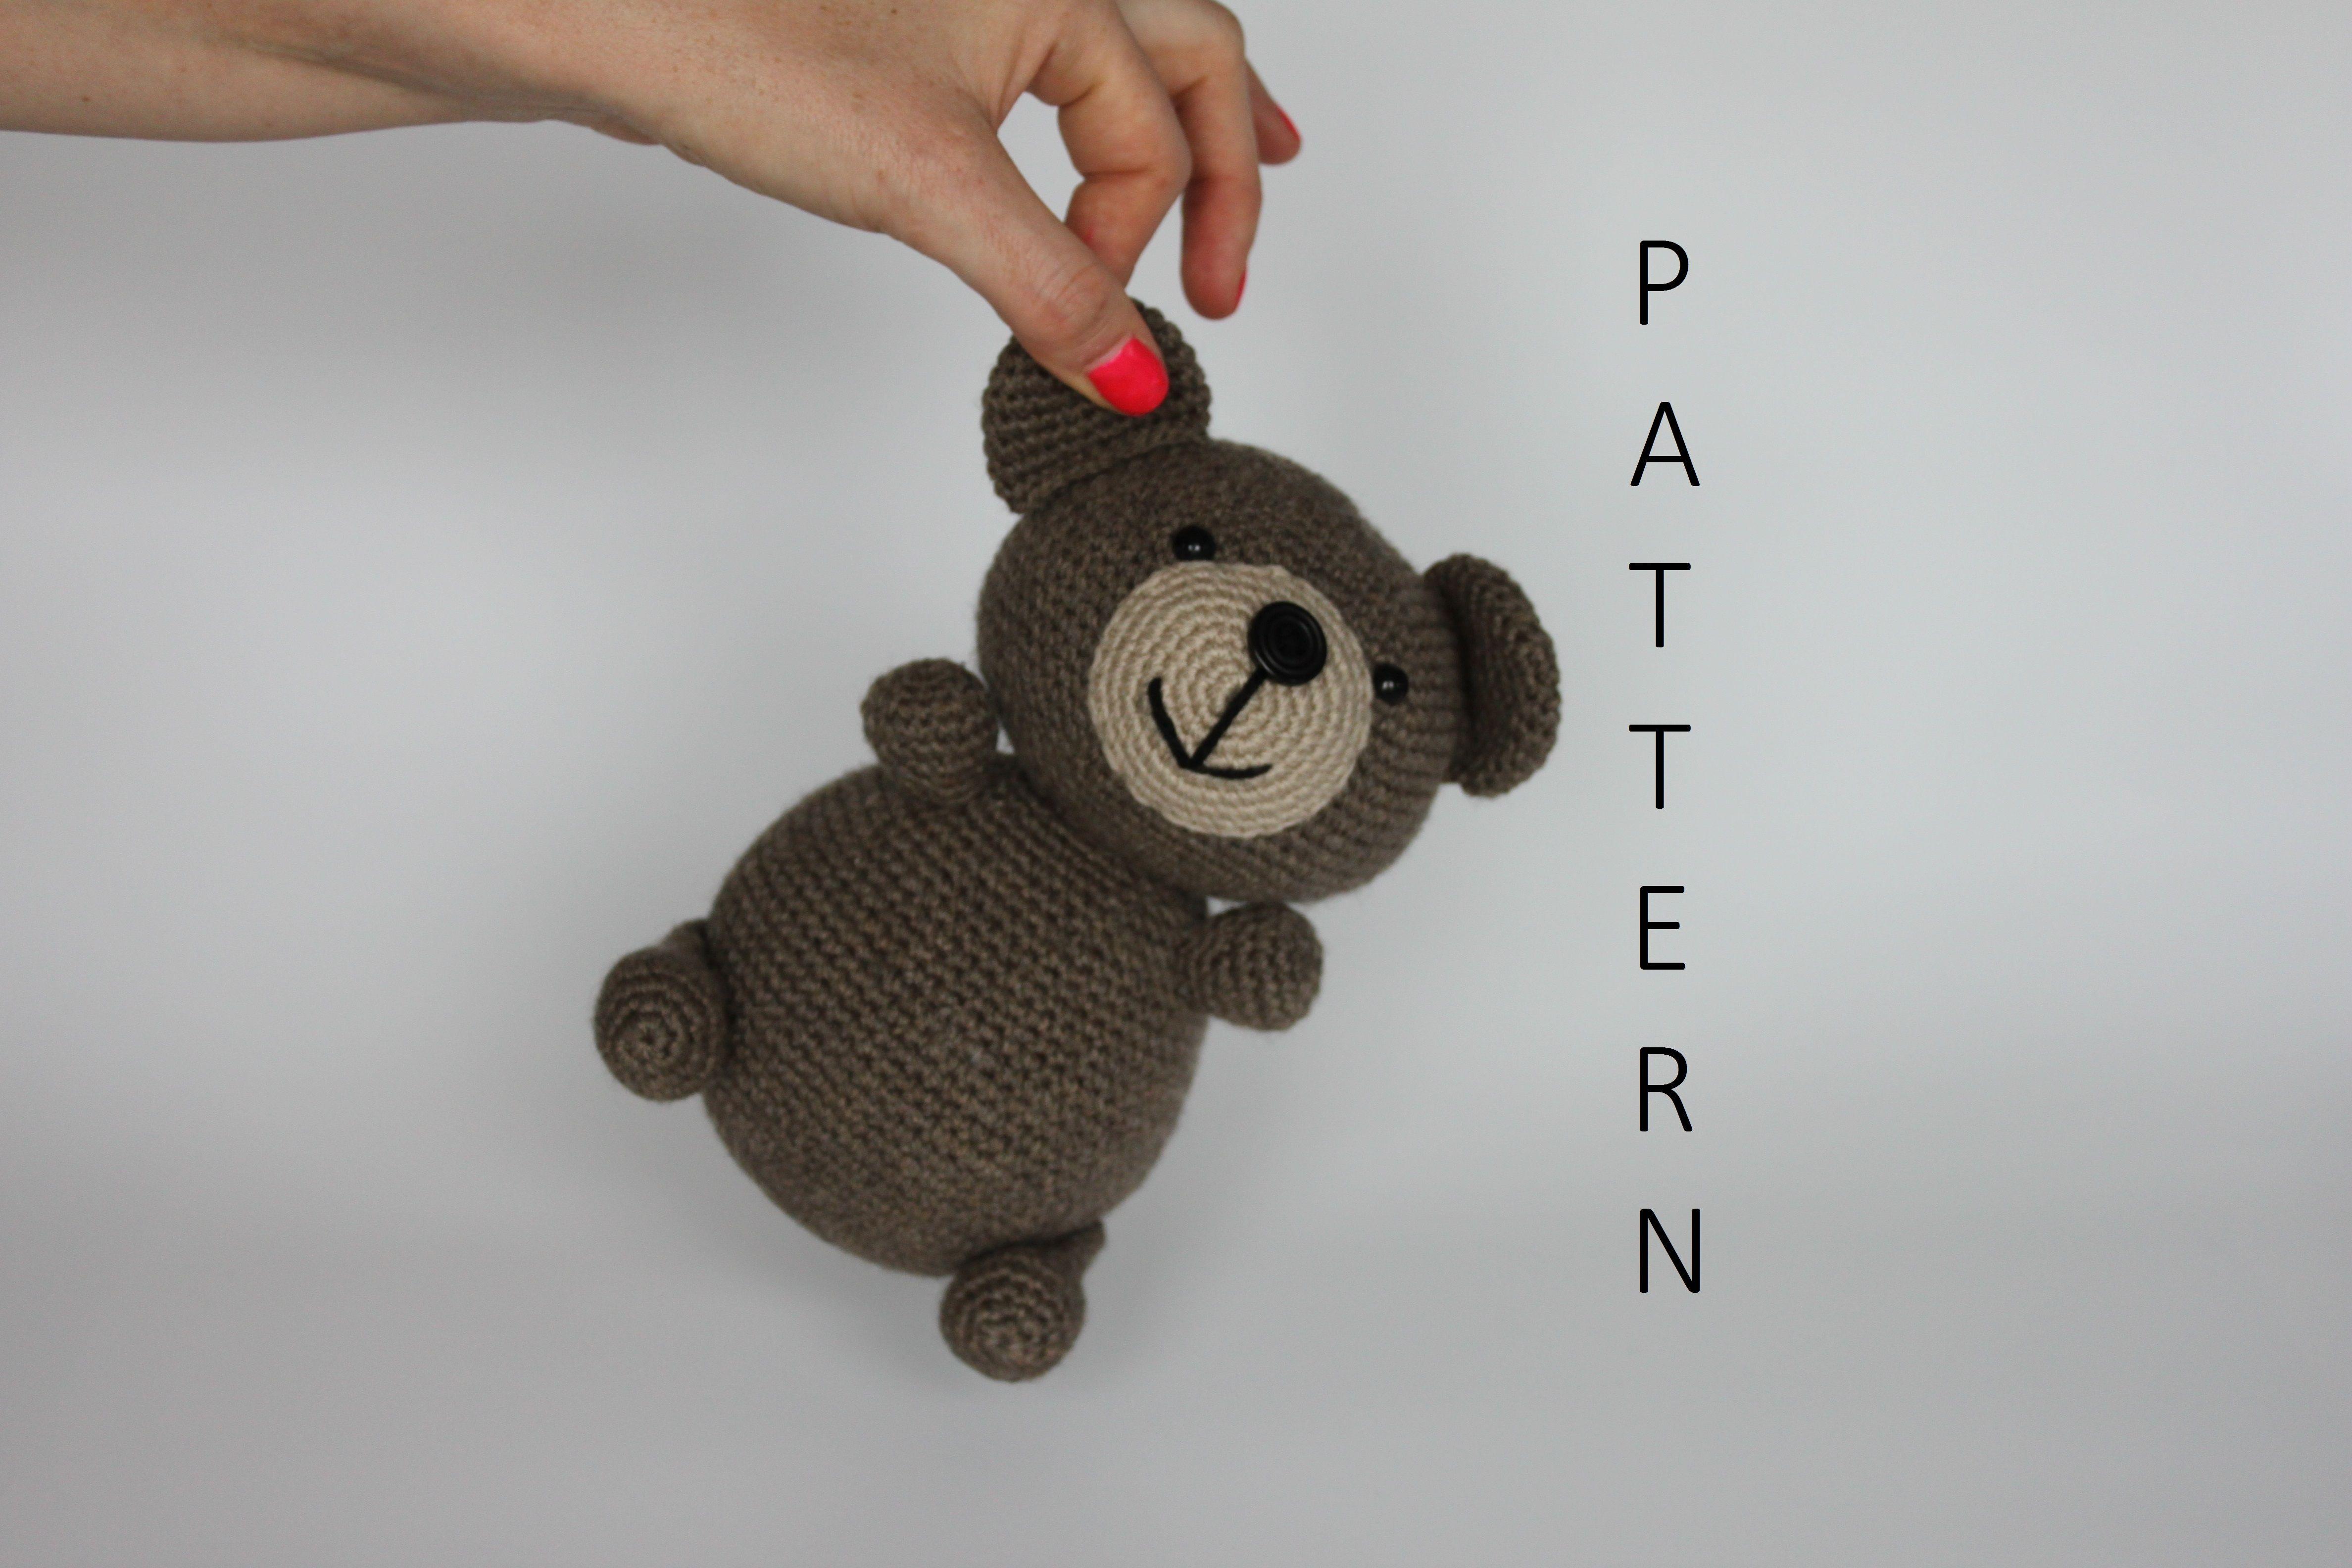 Amigurumi Crochet Patterns Teddy Bears : An amigurumi crochet pattern by crochet by starsha teddy bear